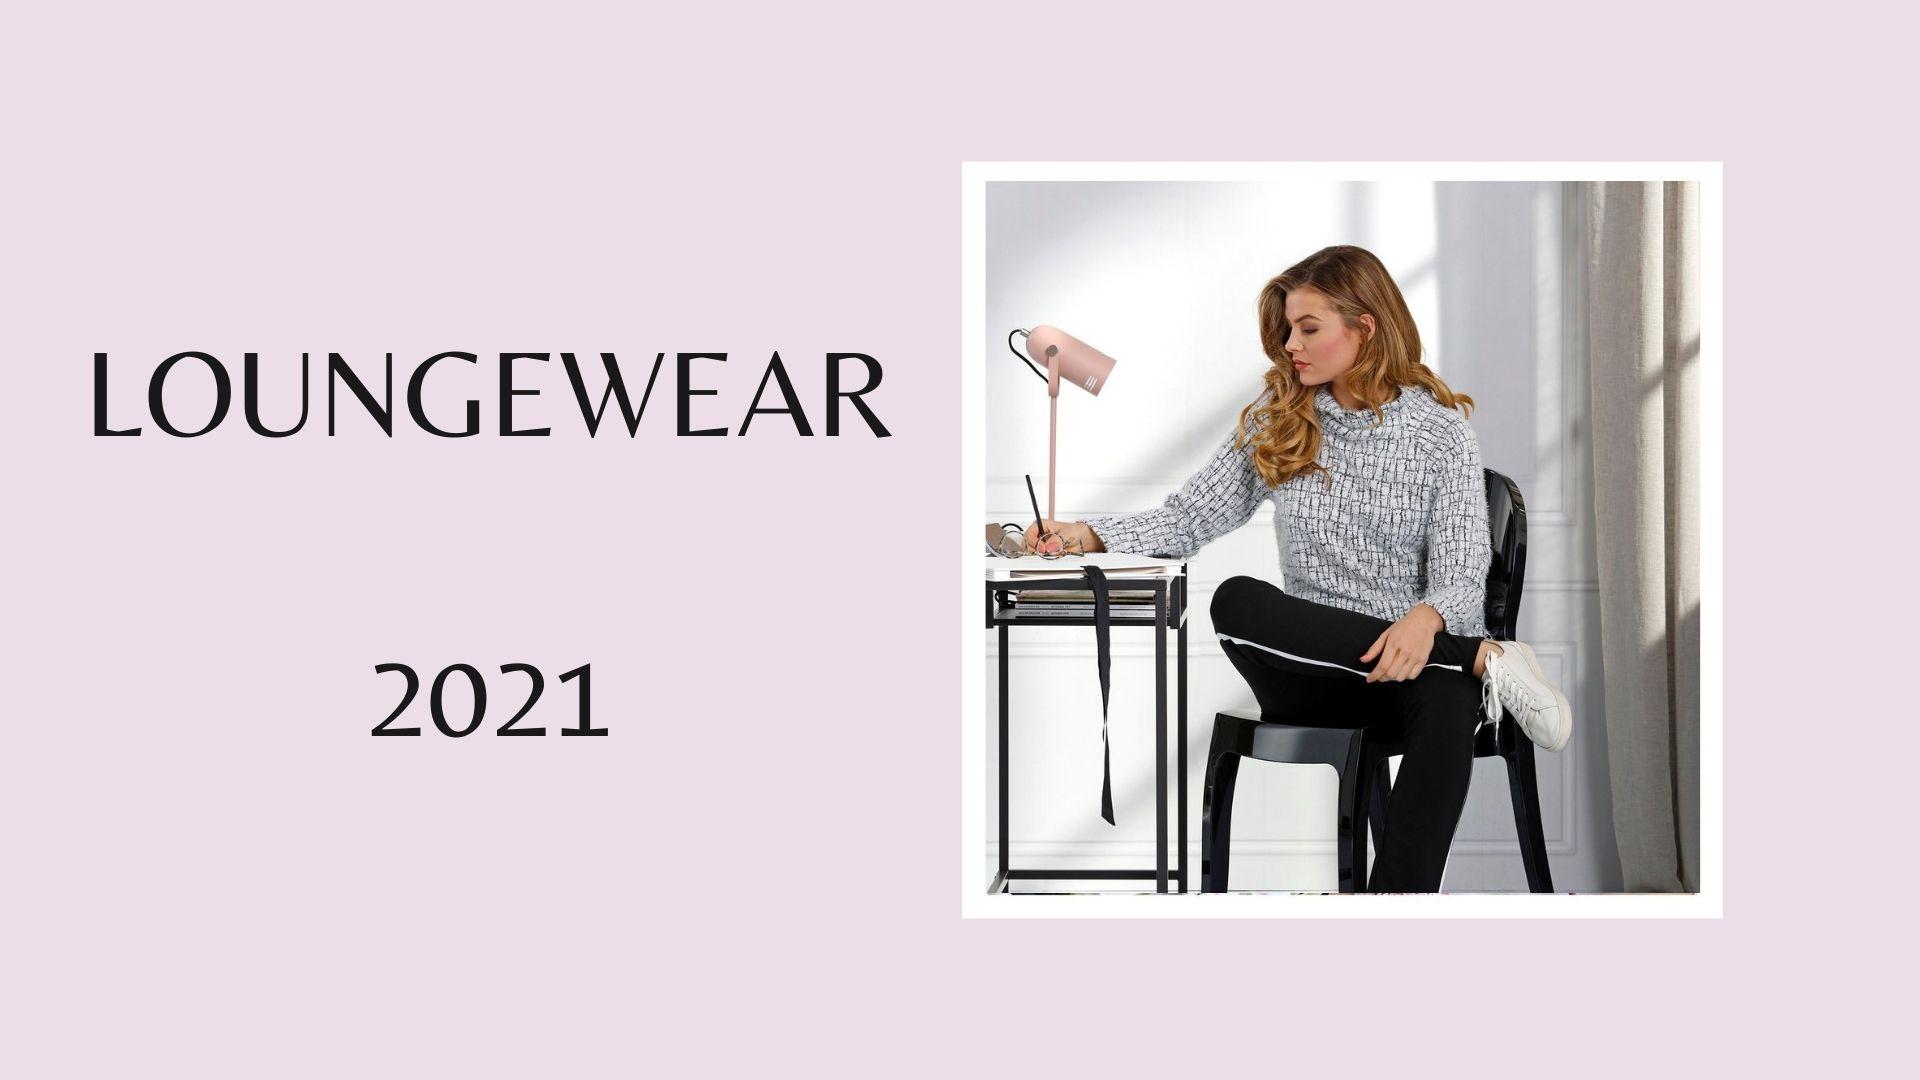 loungewear_najaar 2021_FiguraLingerie